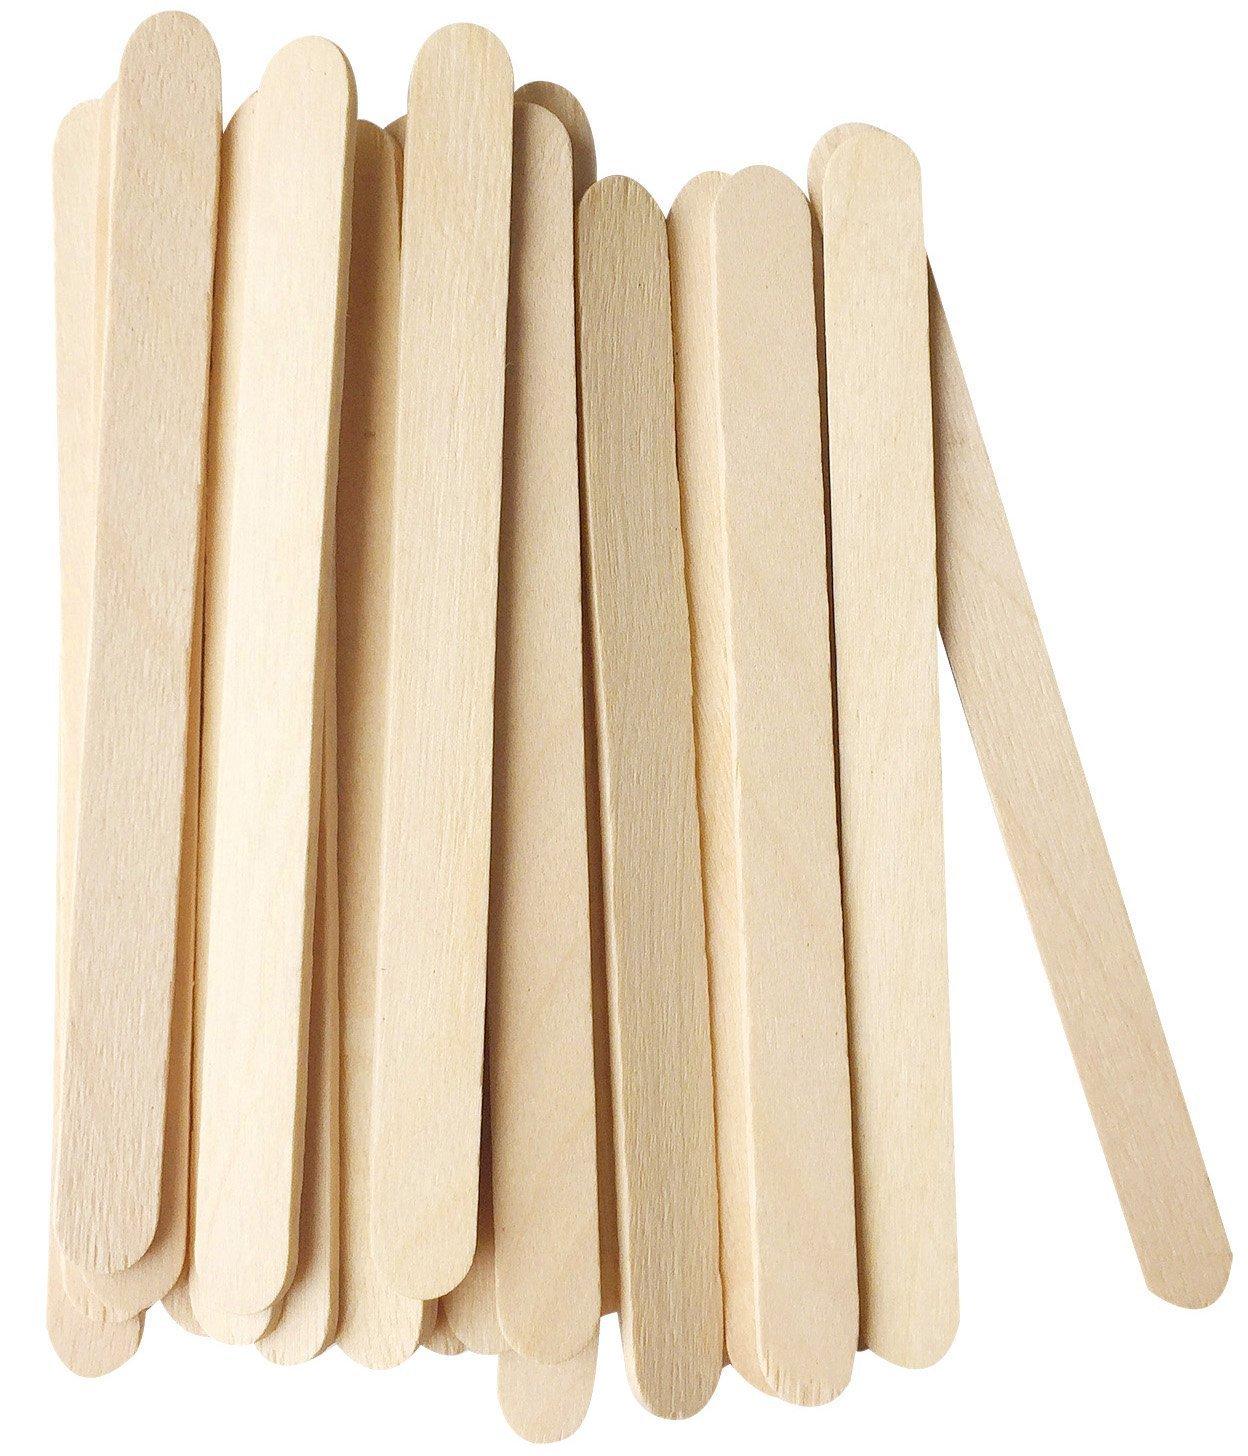 74d0cb90dd Details about Korlon 200 Pcs Craft Sticks Ice Cream Sticks Wooden Popsicle  Sticks